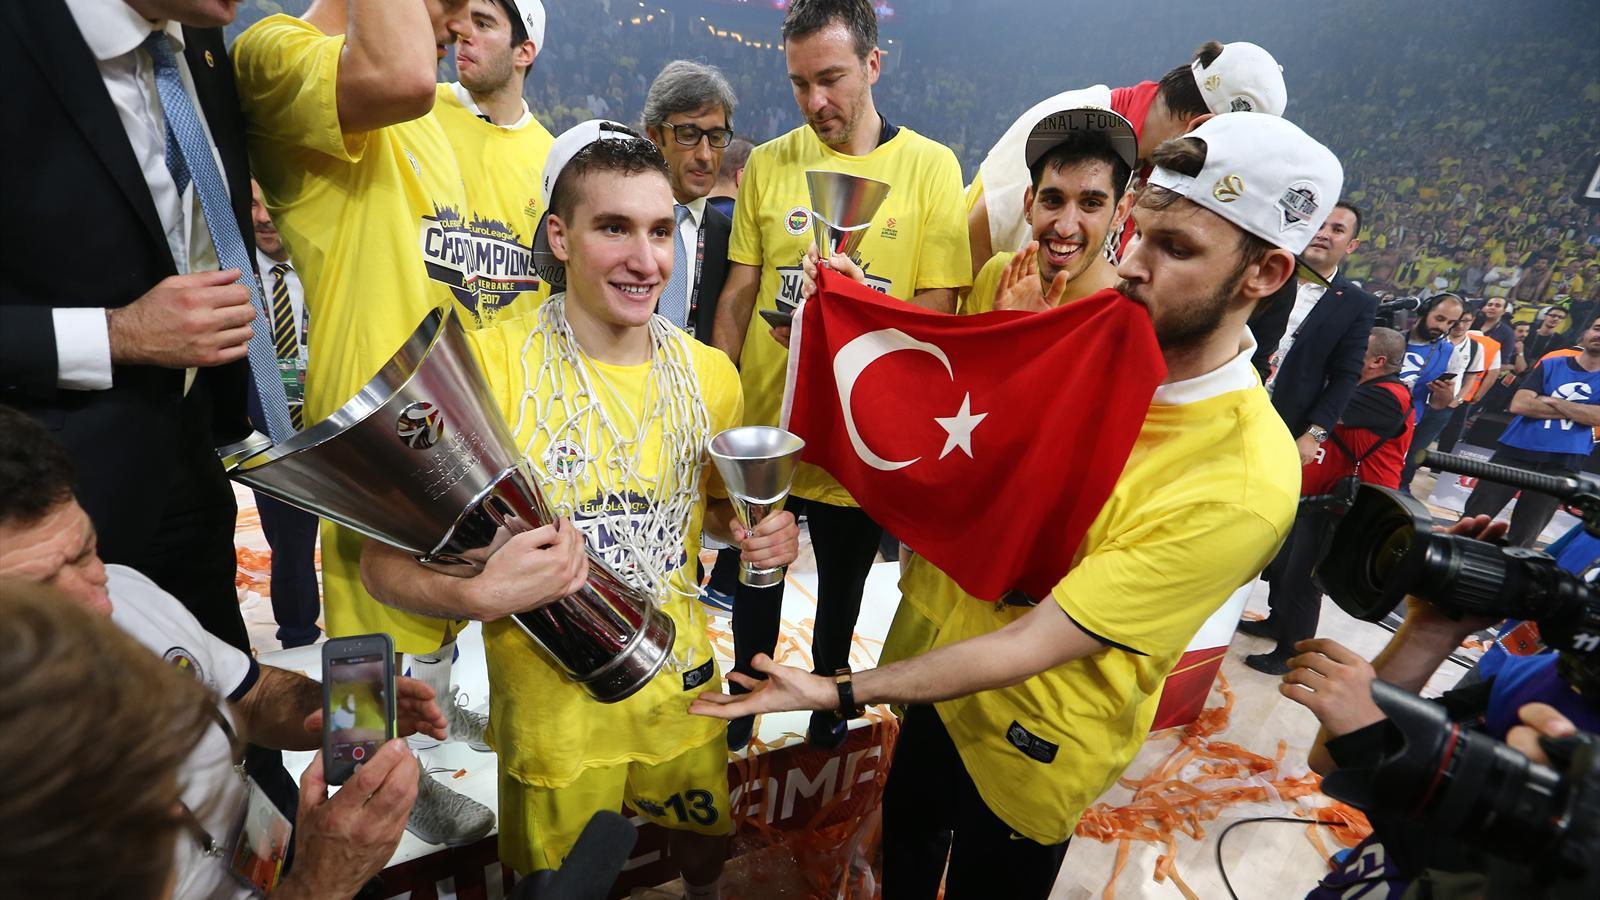 EuroLeague 2017/18: Schedule, Final Four, Championship, results, table, watch on Eurosport ...